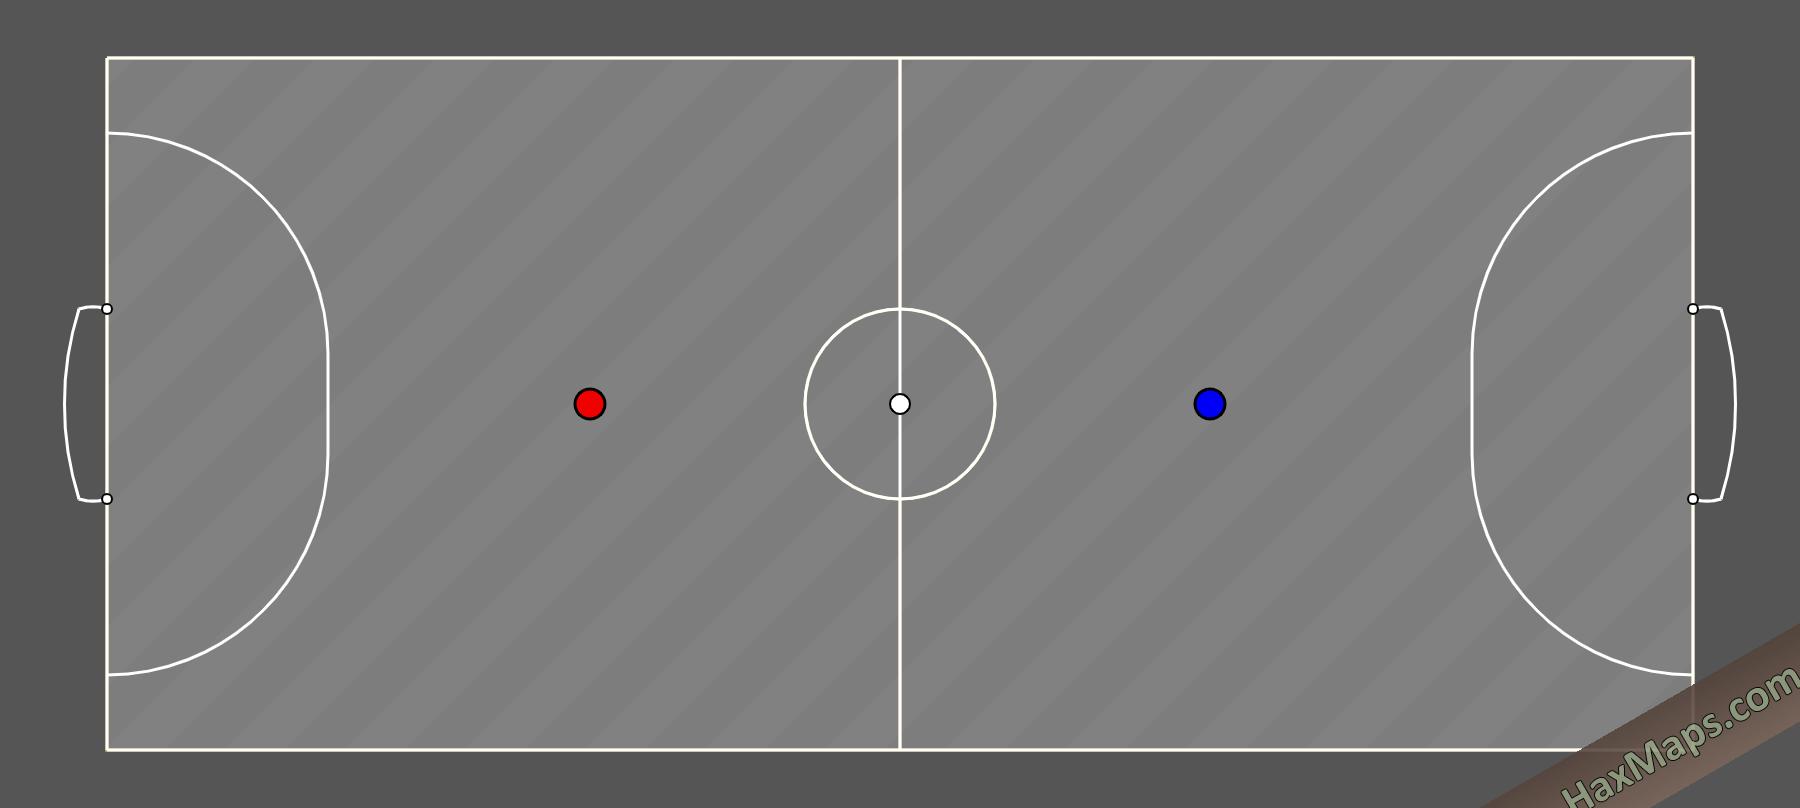 hax ball maps | Futsal 5x5 6x6 HaxMaps Lesk